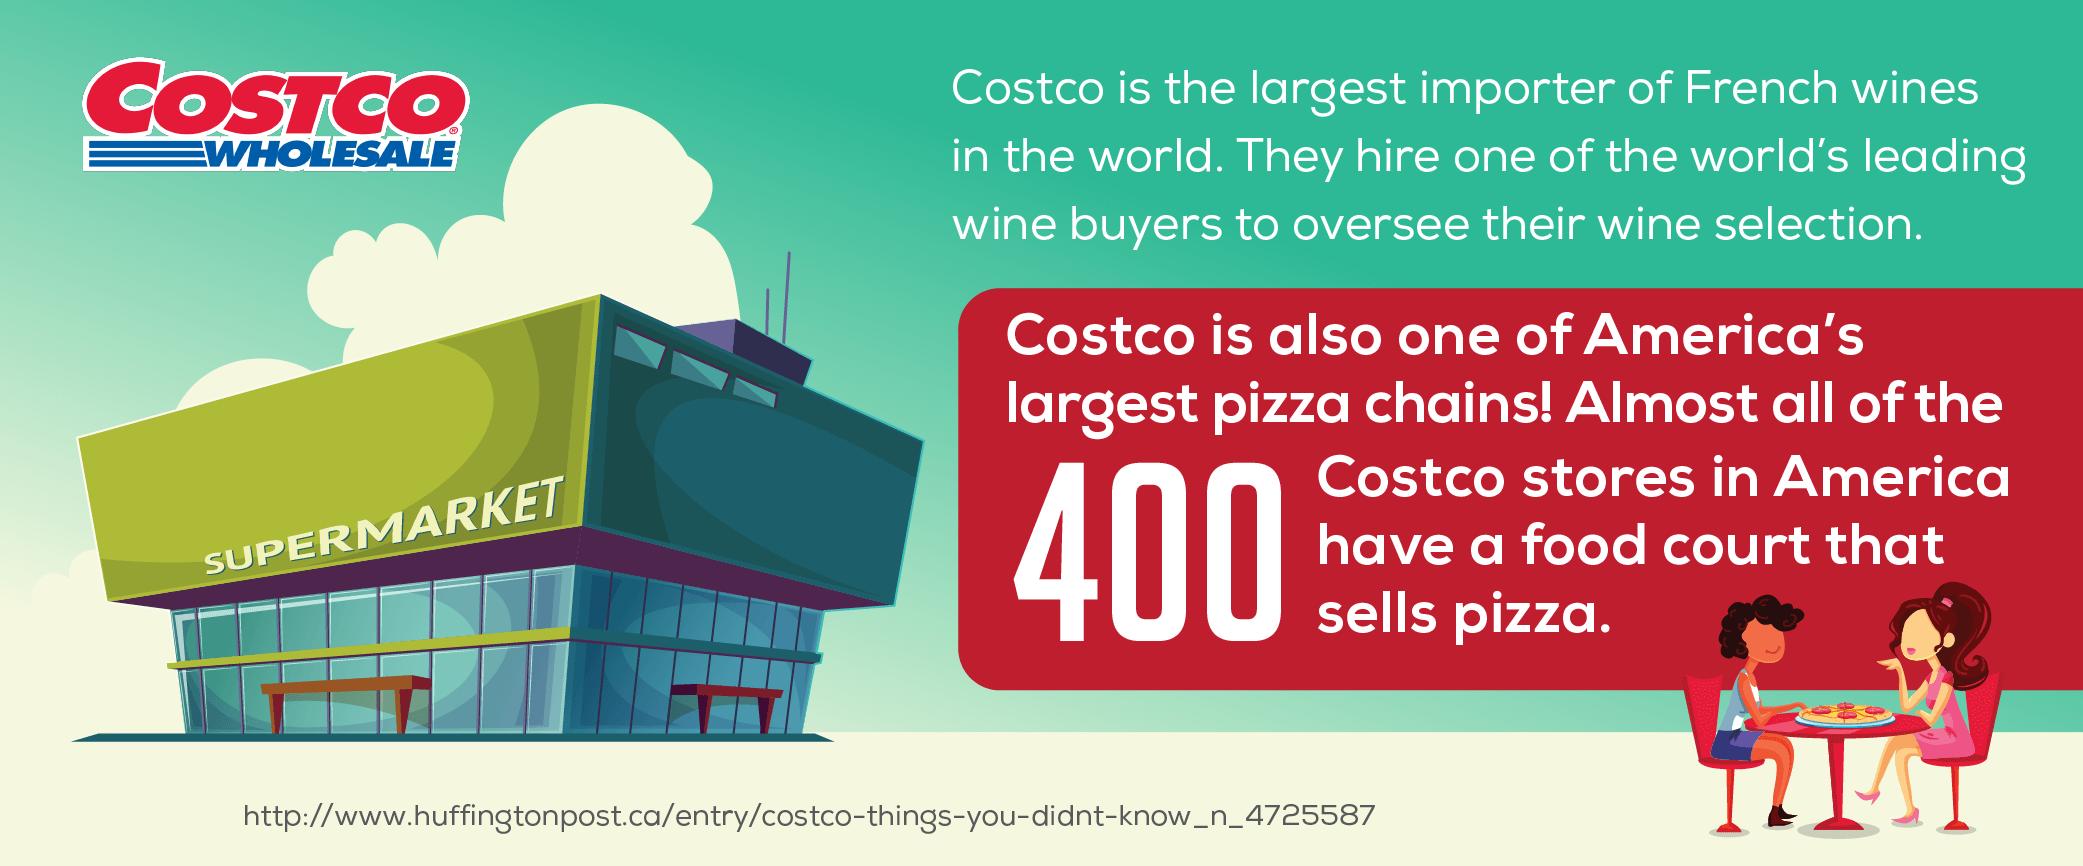 Costco Citi Visa Travel Benefits Review